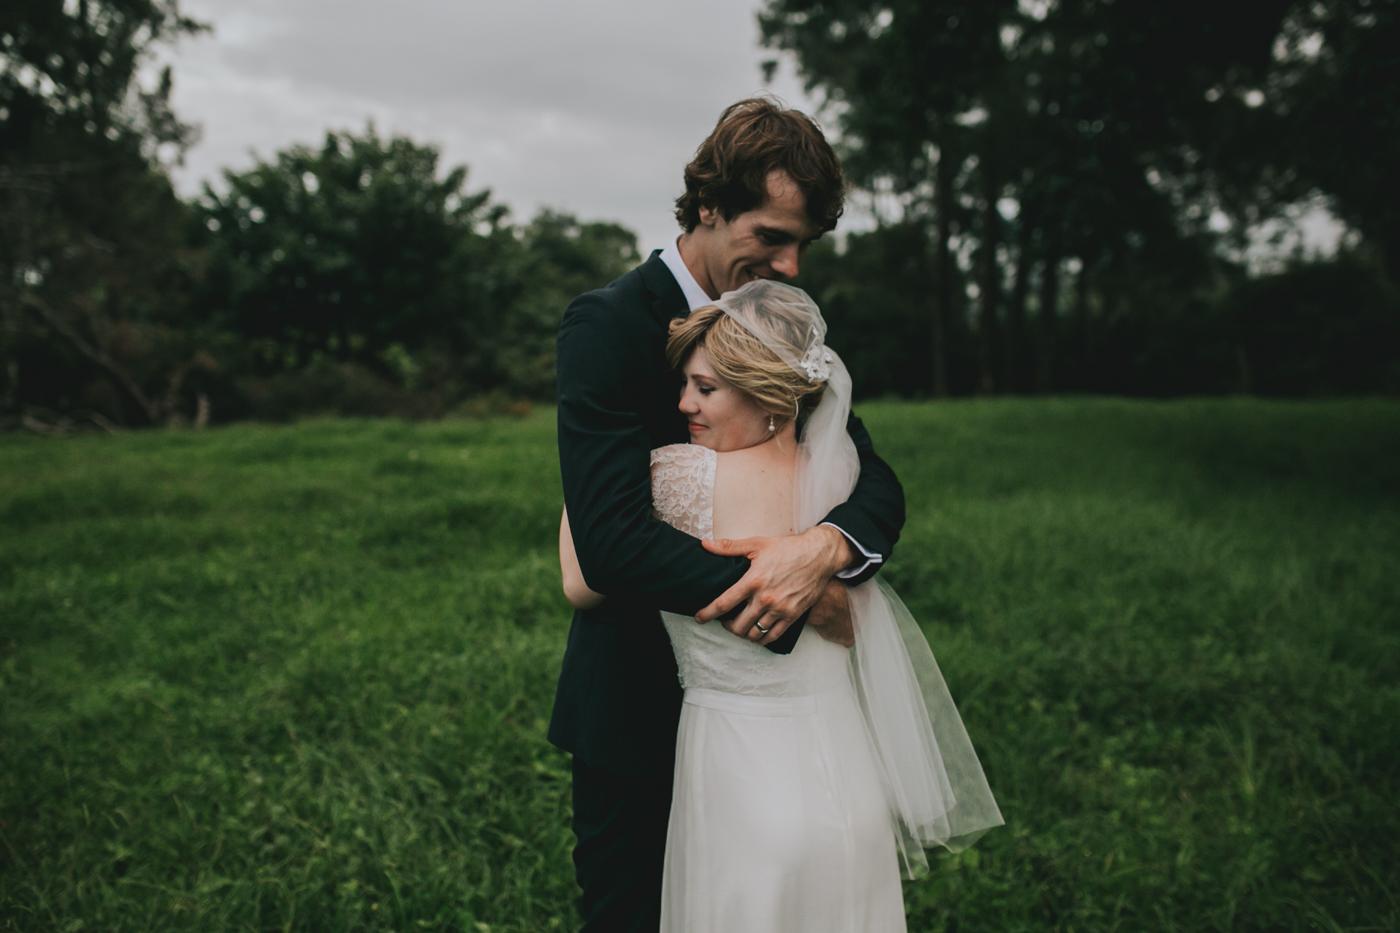 Rachel & Jacob - Willow Farm Berry - South Coast Wedding - Samantha Heather Photography-161.jpg